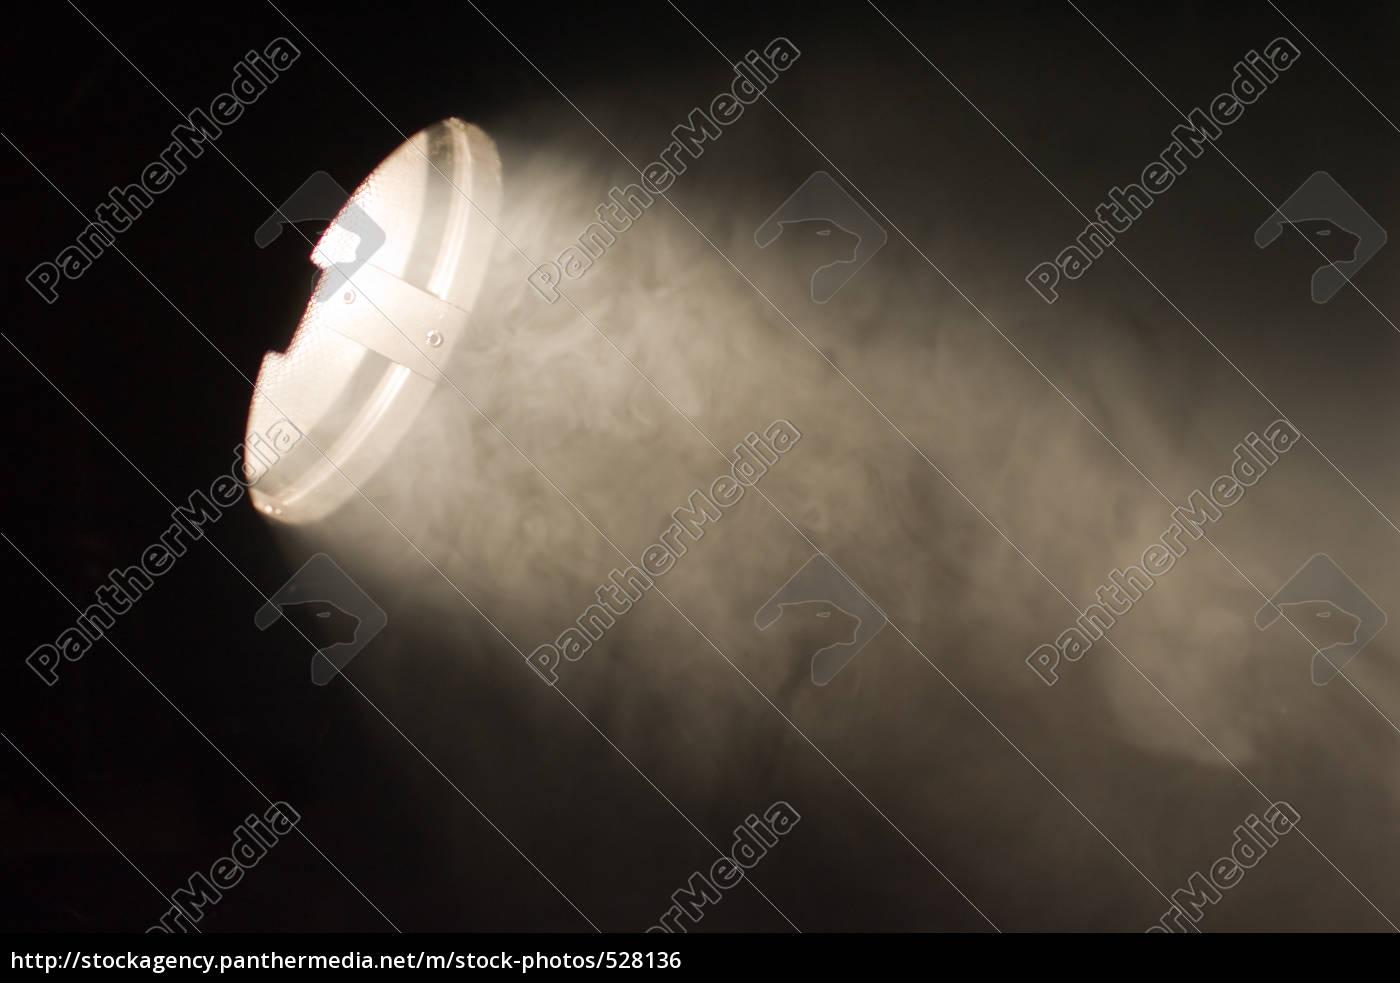 lichtstrahl, im, nebel - 528136